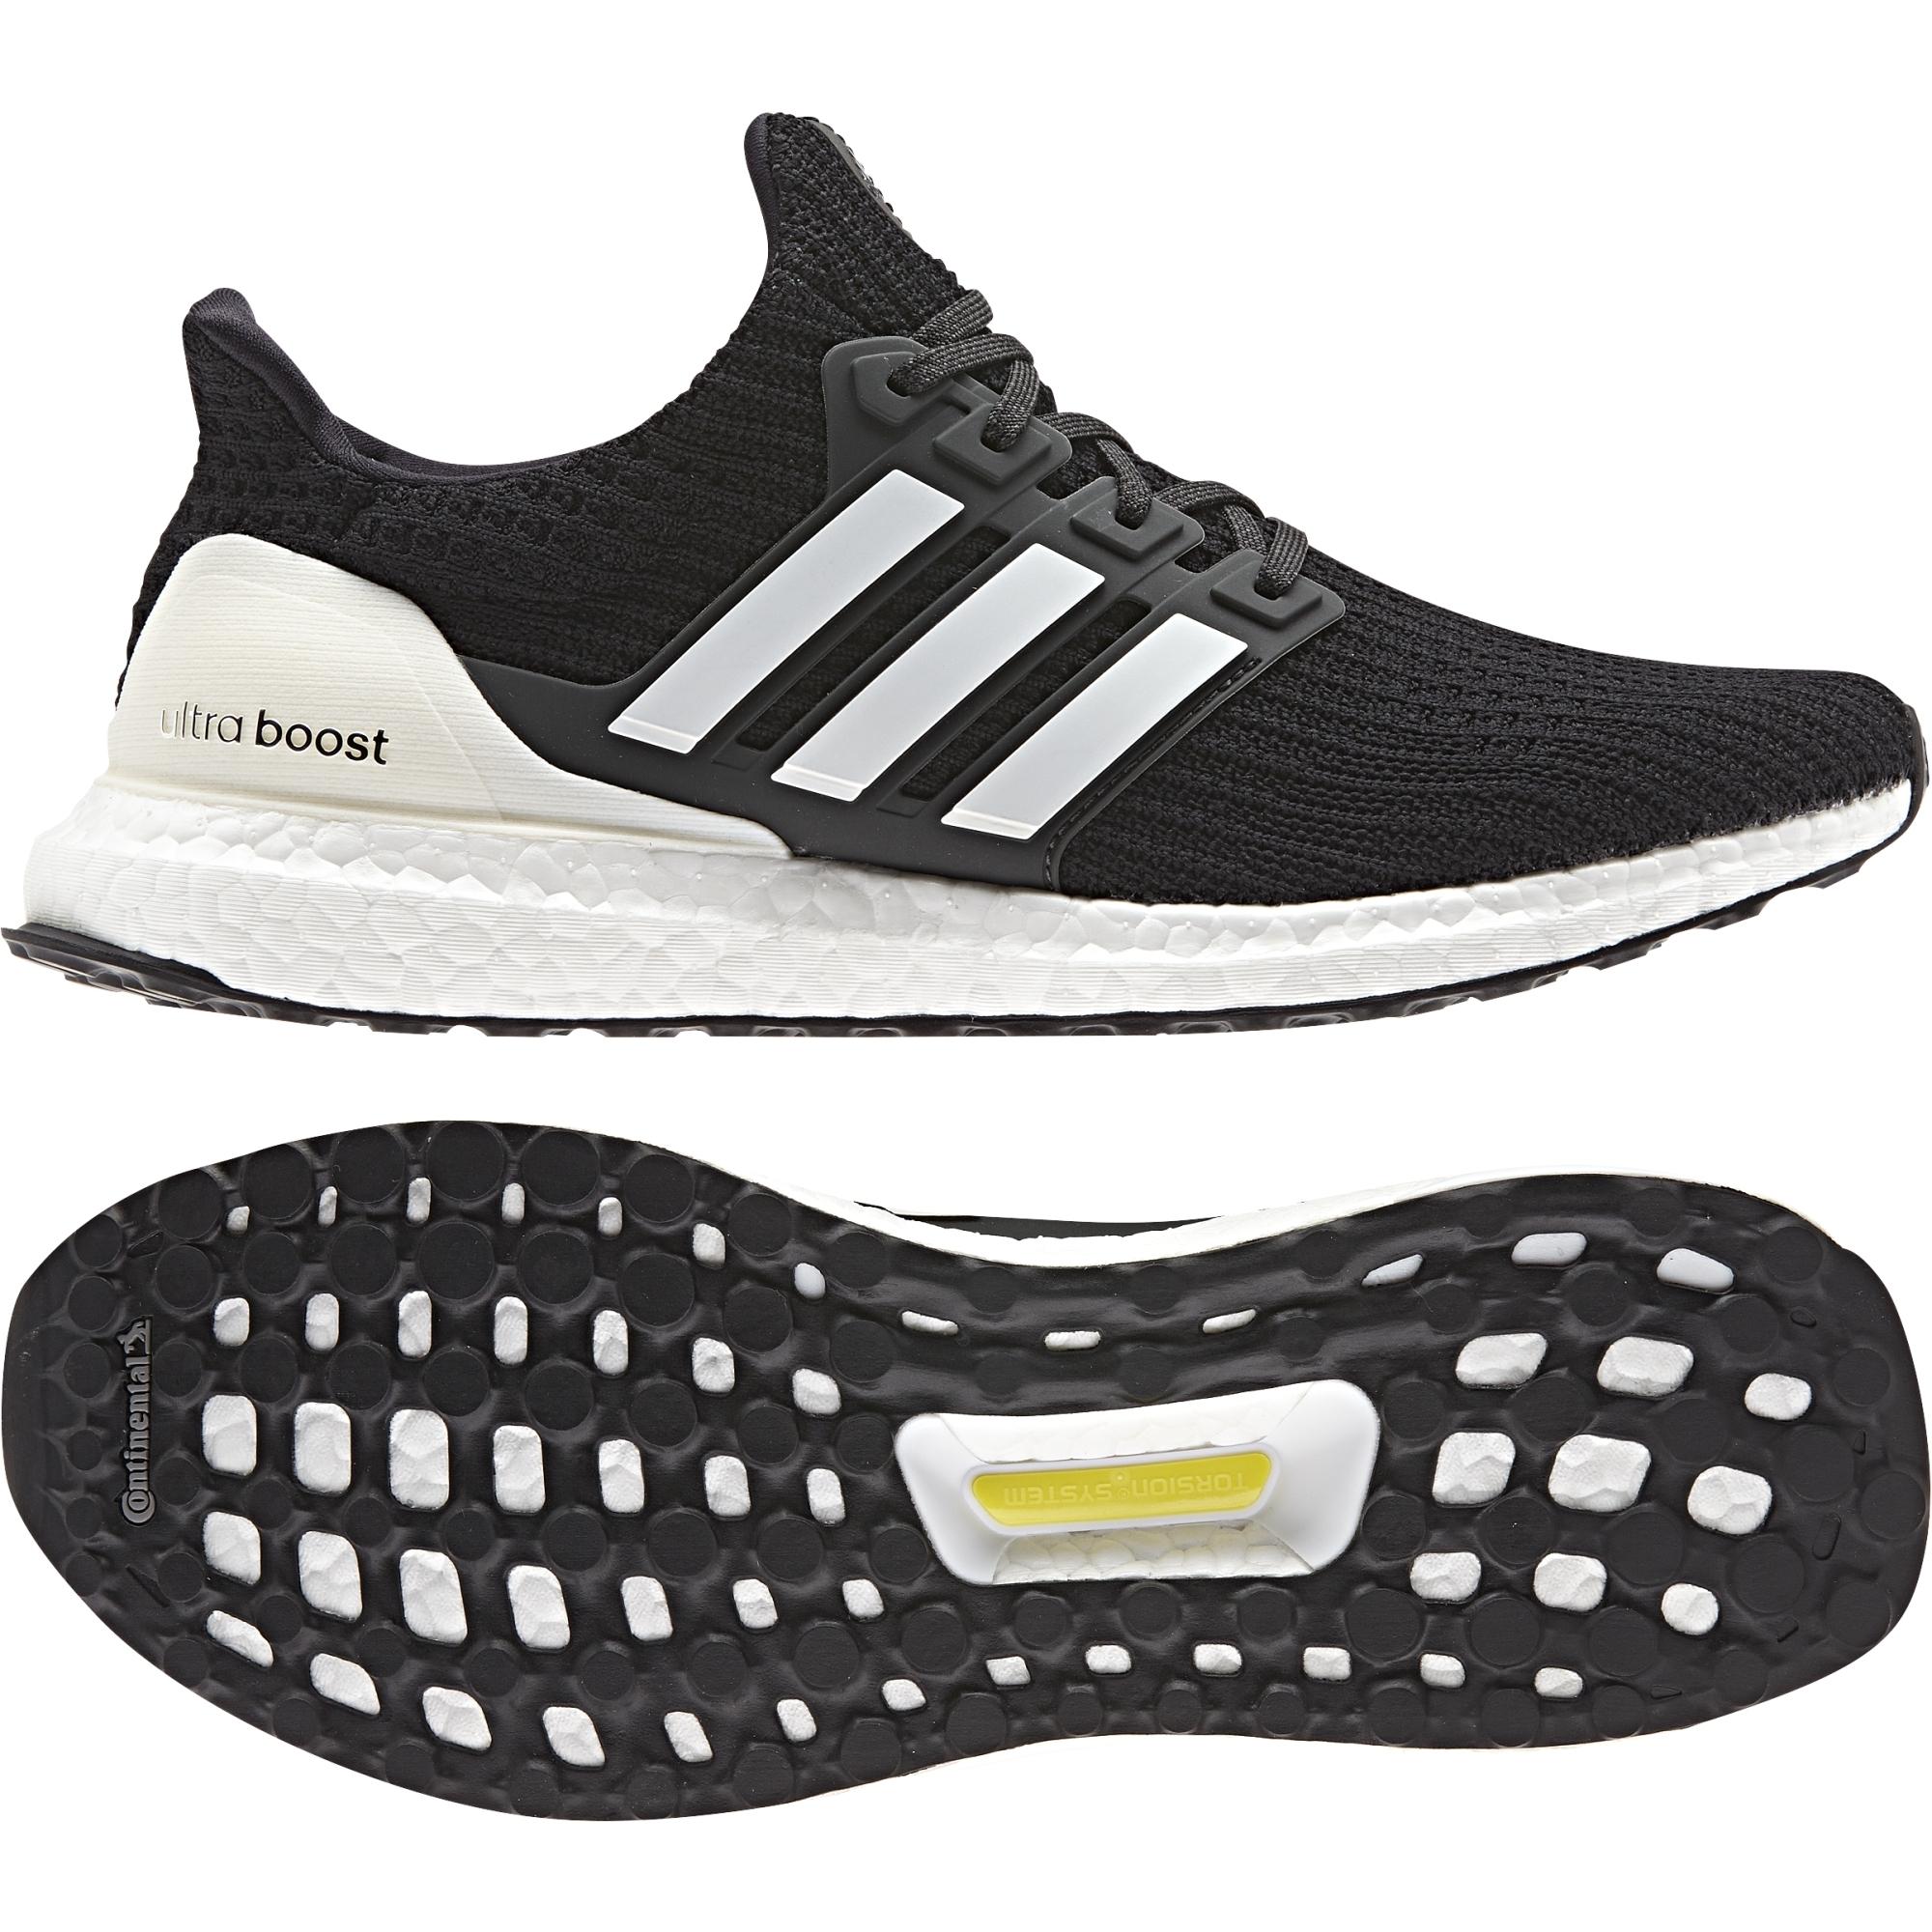 d7eb186152b Chaussures adidas Ultraboost